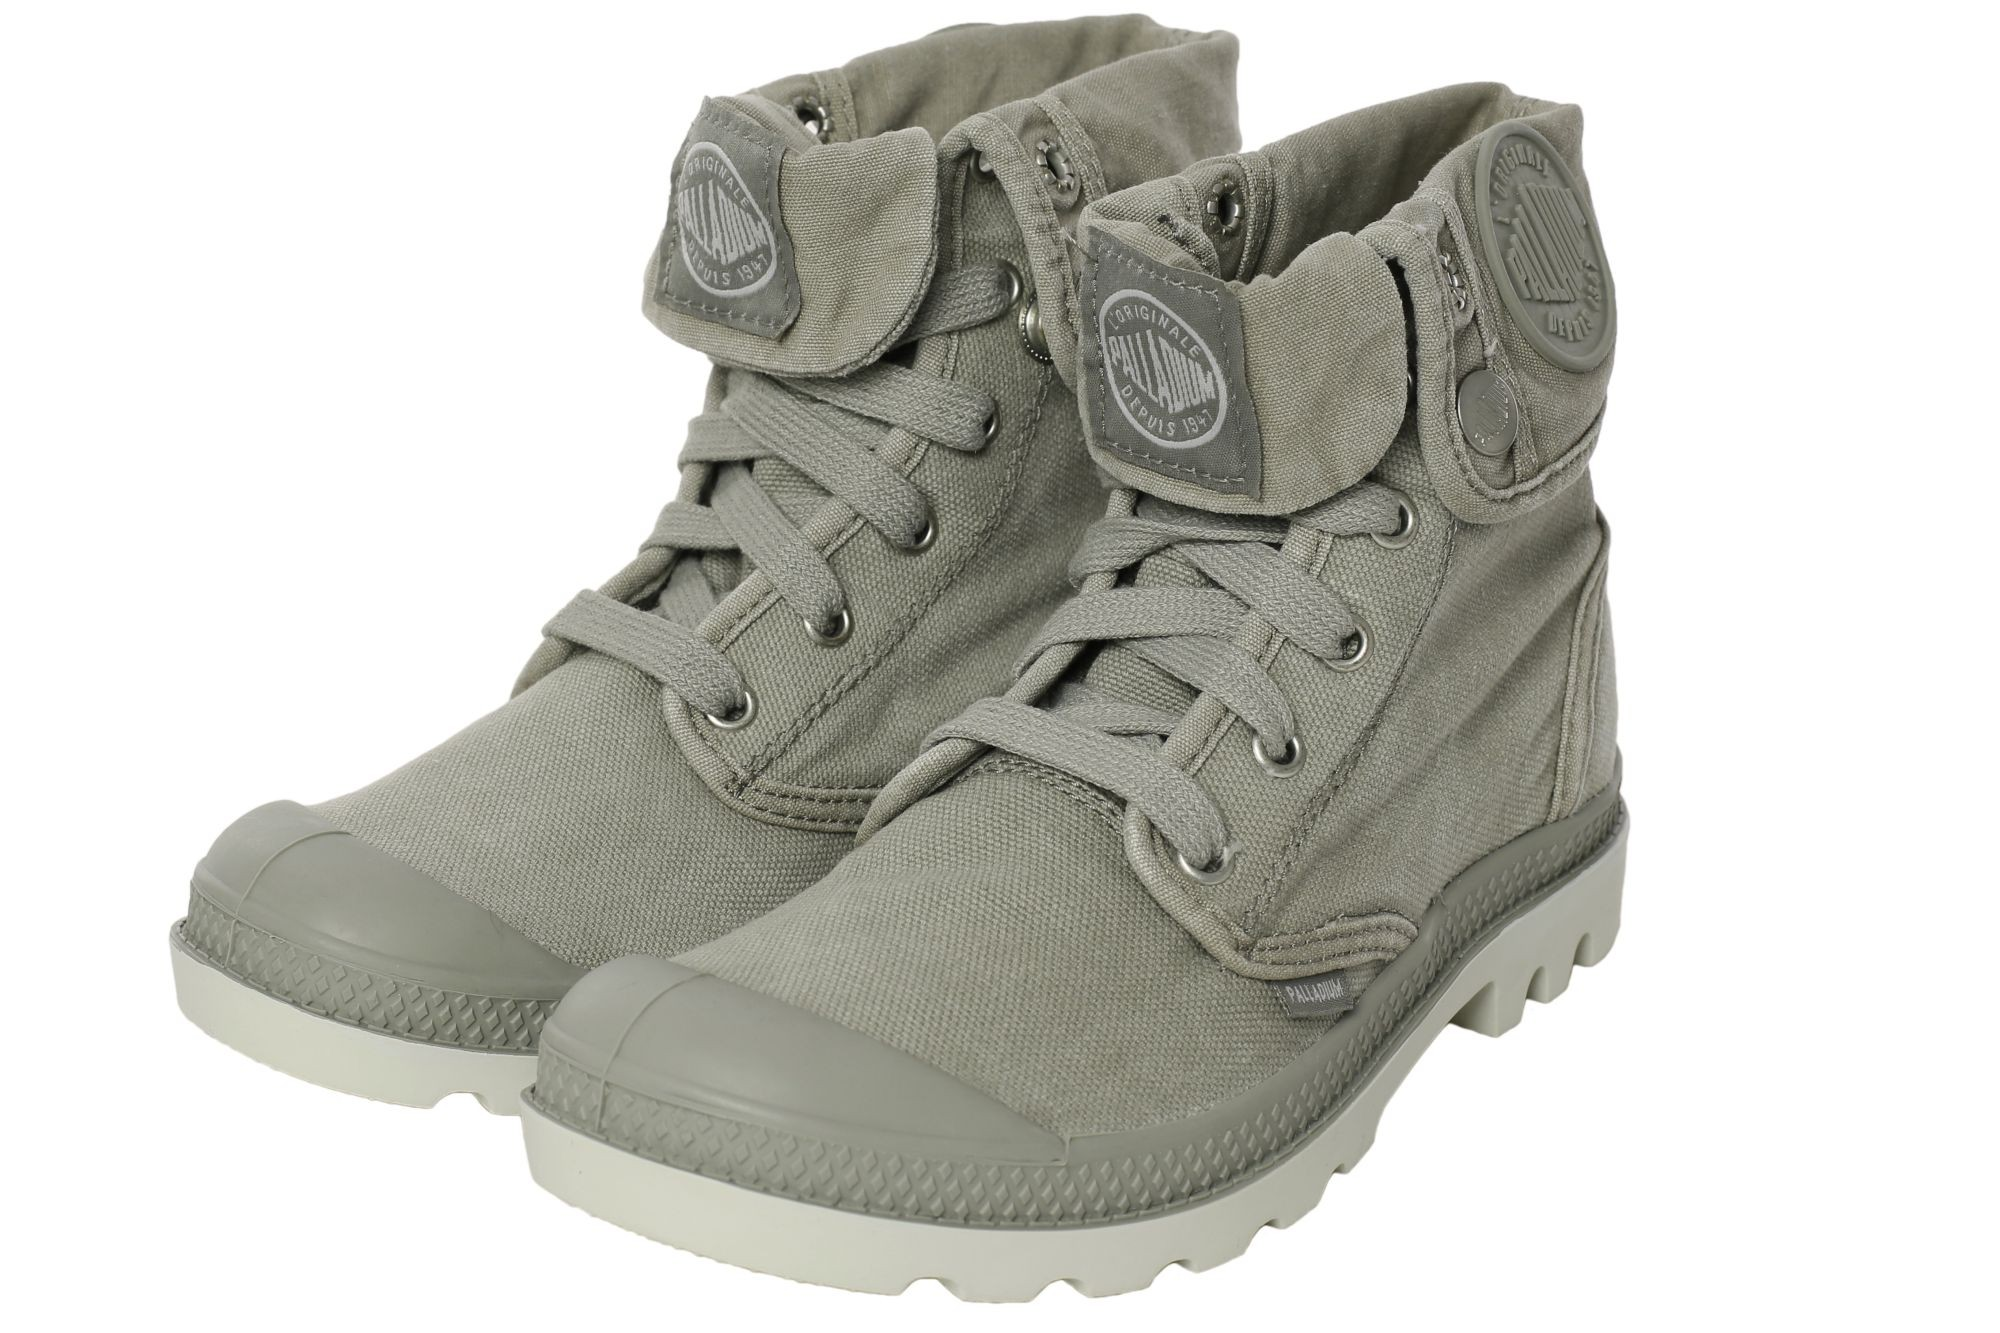 palladium baggy boots stiefel sneaker turnschuh canvas damen ebay. Black Bedroom Furniture Sets. Home Design Ideas